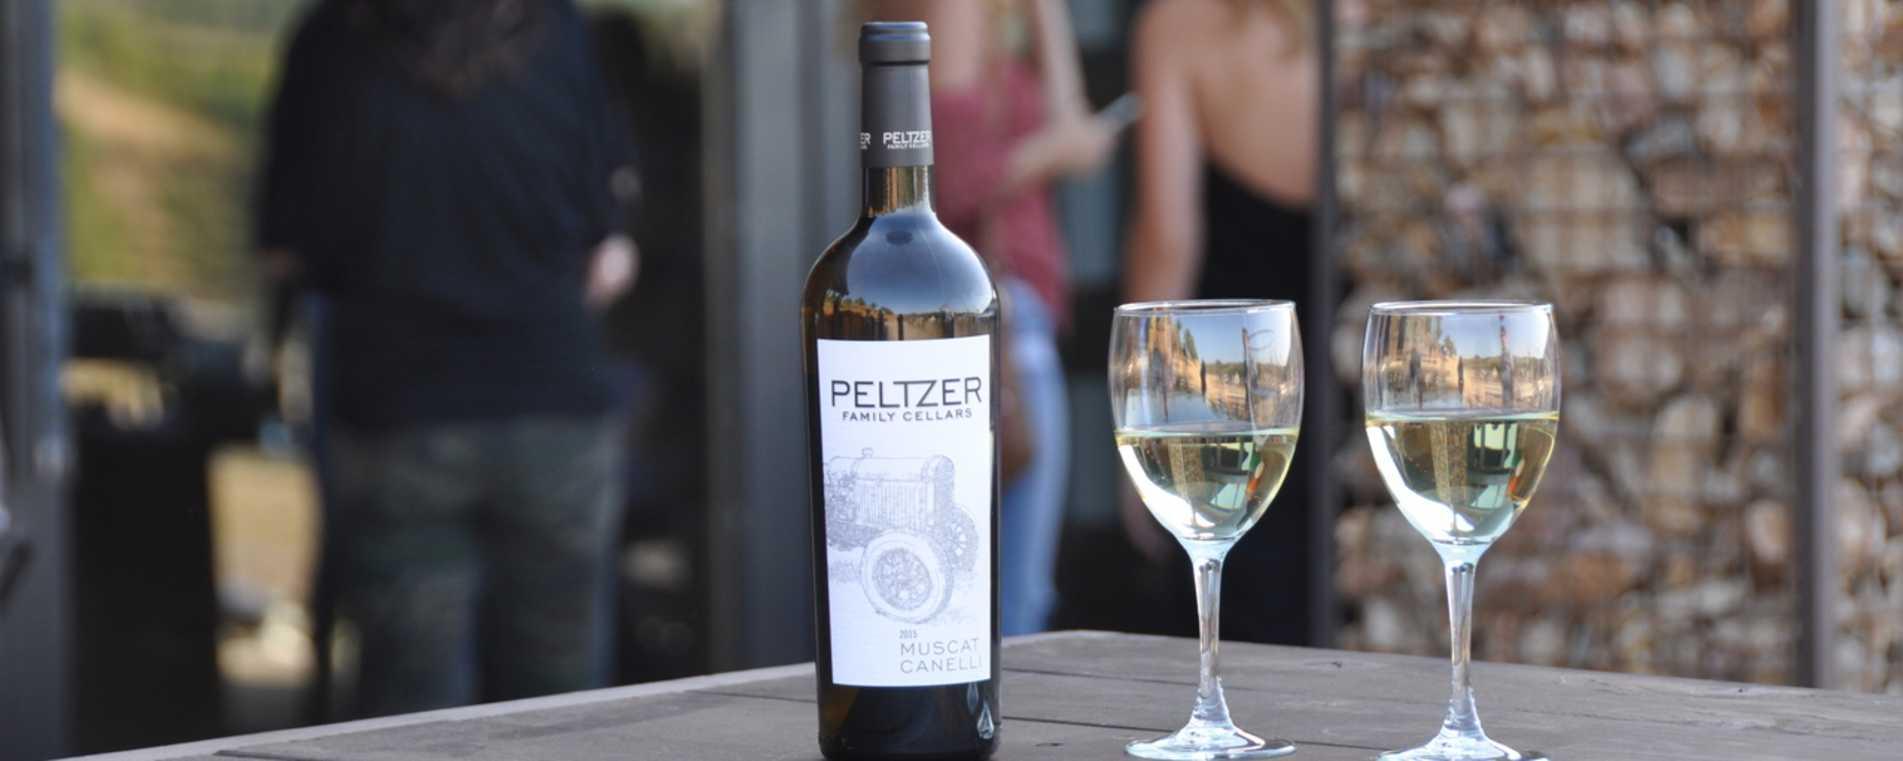 Wine - Peltzer Farms